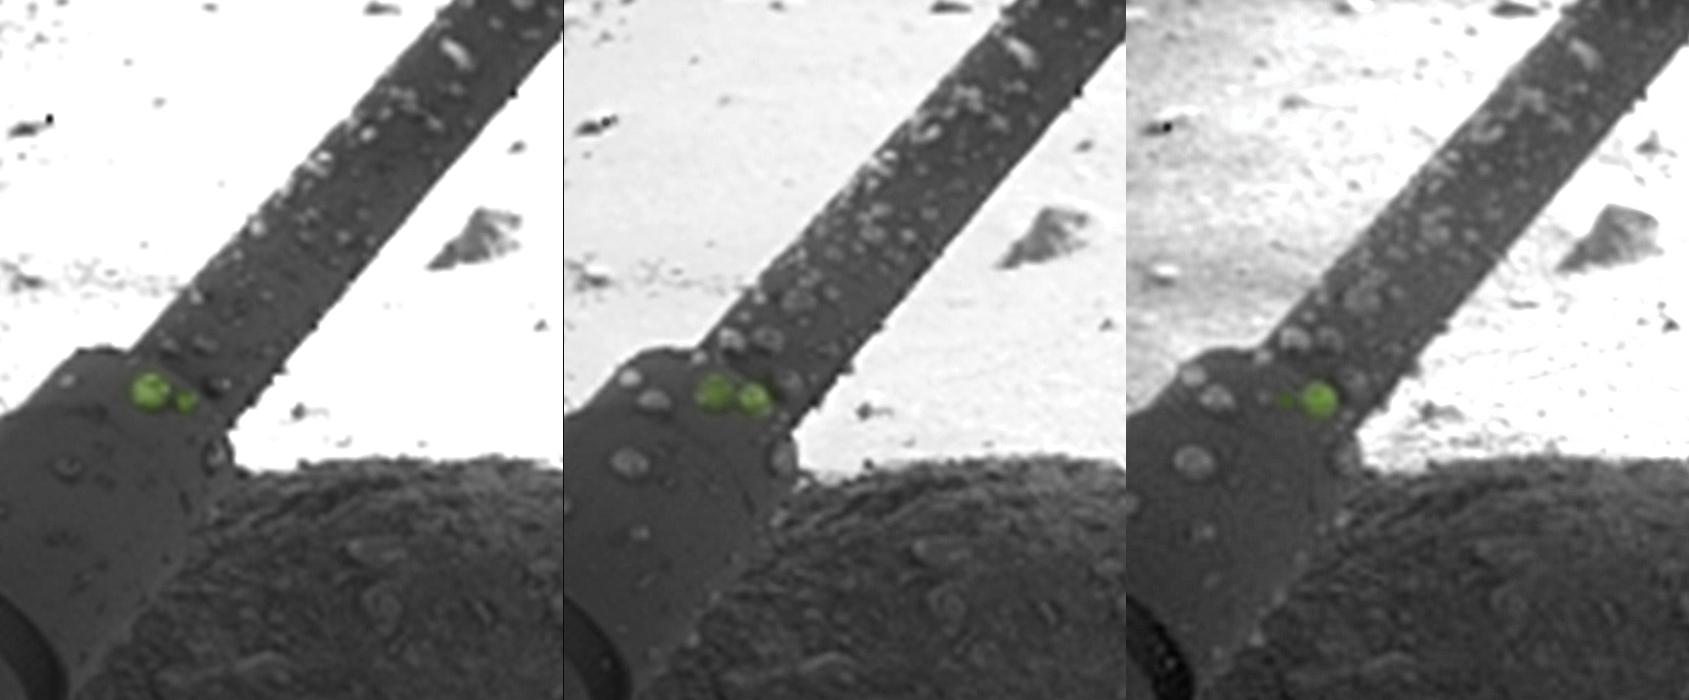 Globules of liquid saltwater were pictured on the leg of the Phoenix Mars Lander. NASA/JPL-Caltech/University of Arizona/Max Planck Institute